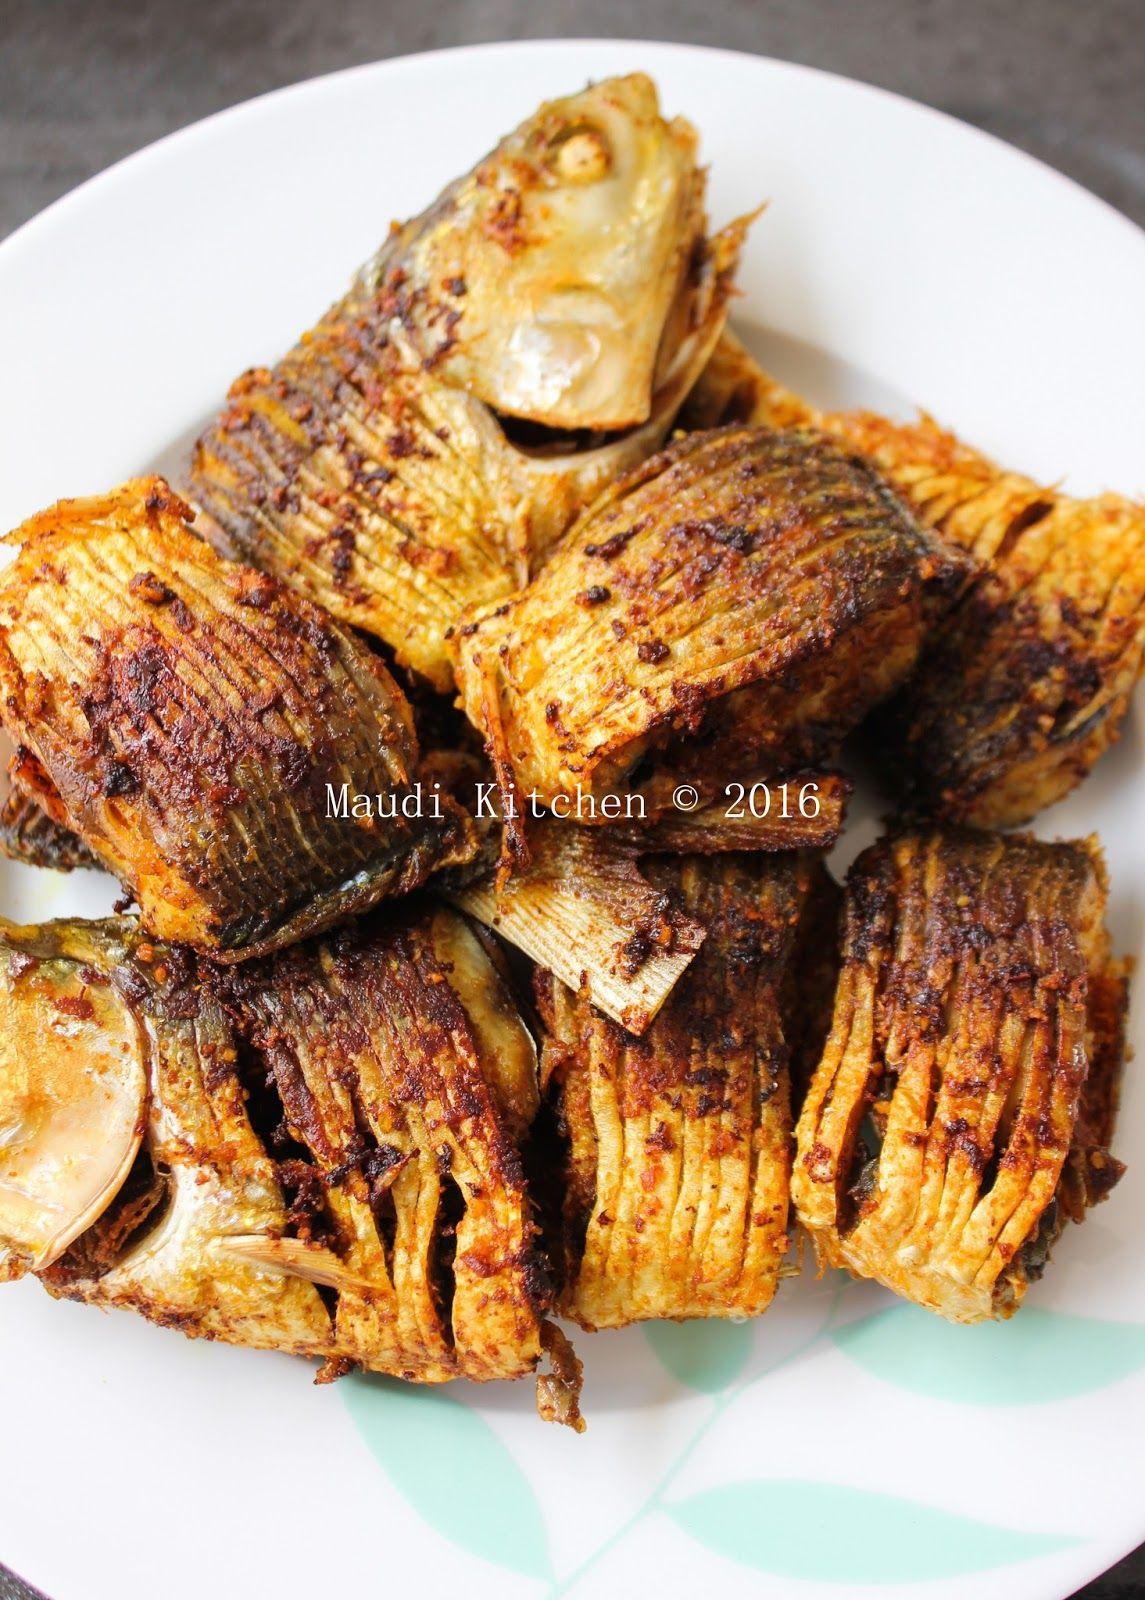 Bandeng Goreng Bebas Duri Tanpa Presto Resep Masakan Indonesia Makanan Ikan Memasak